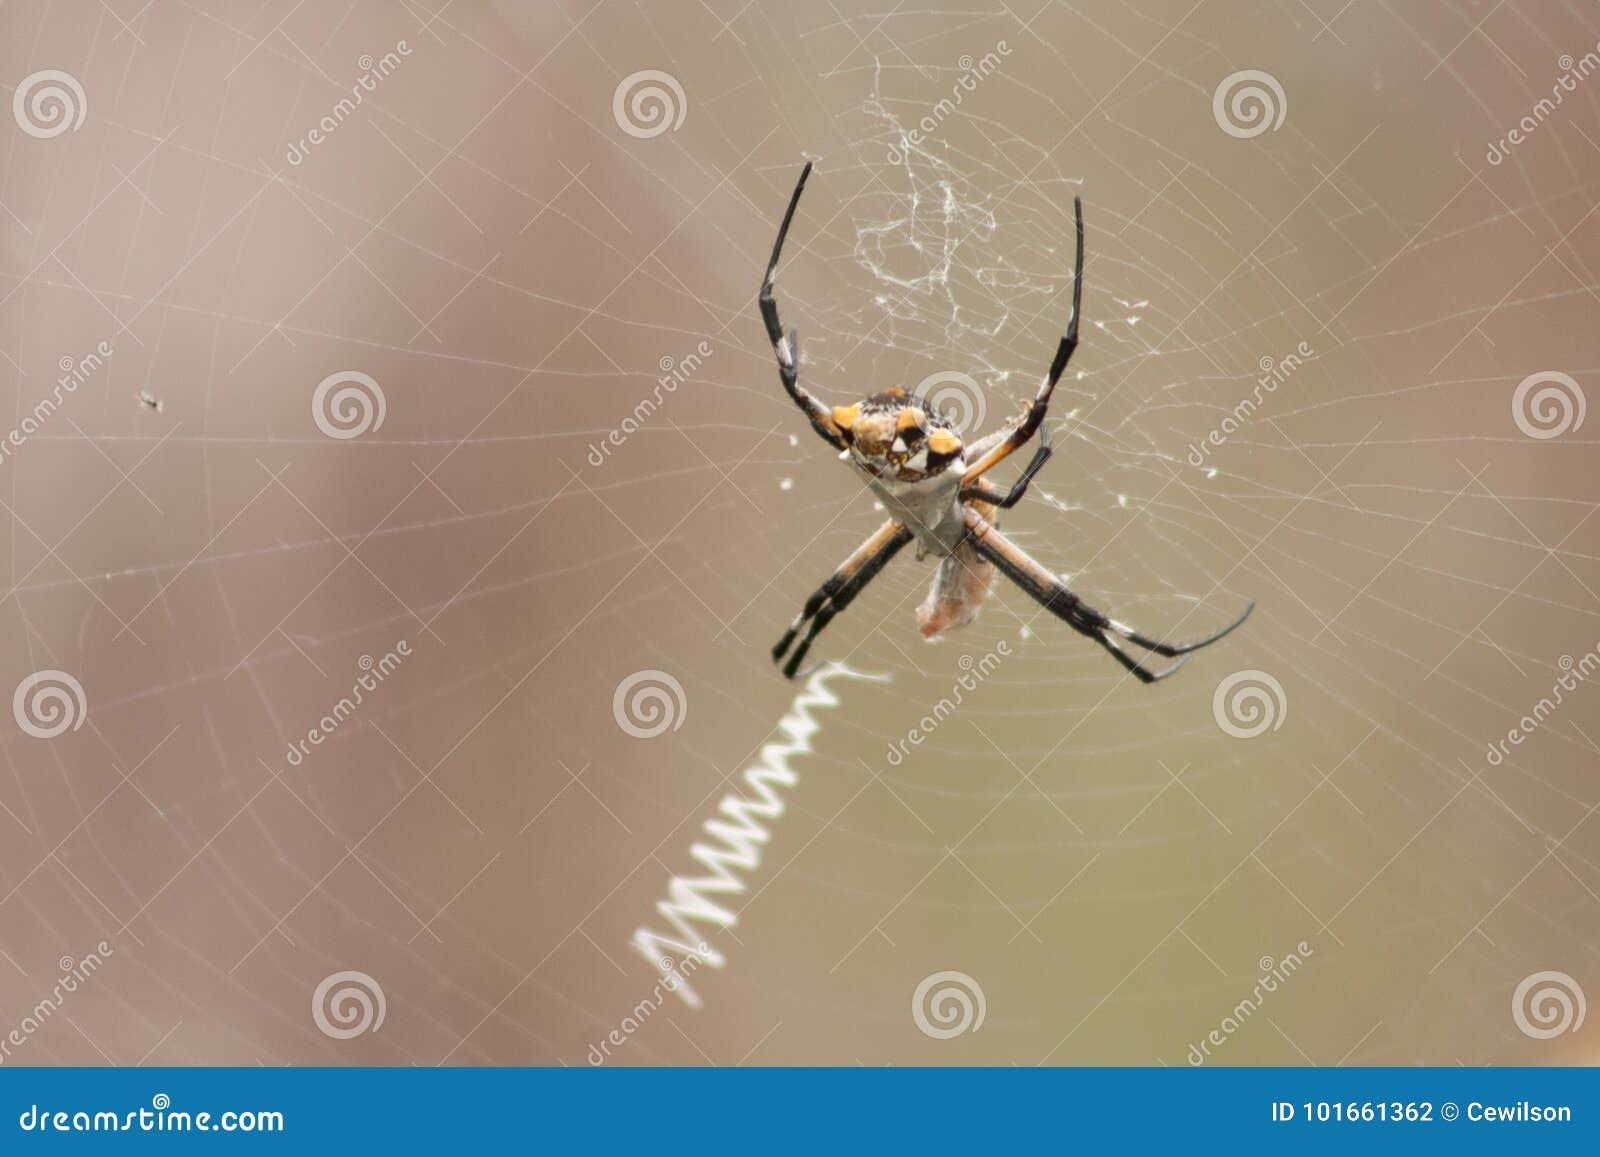 Silver Garden Spider stock photo. Image of midday, garden - 101661362